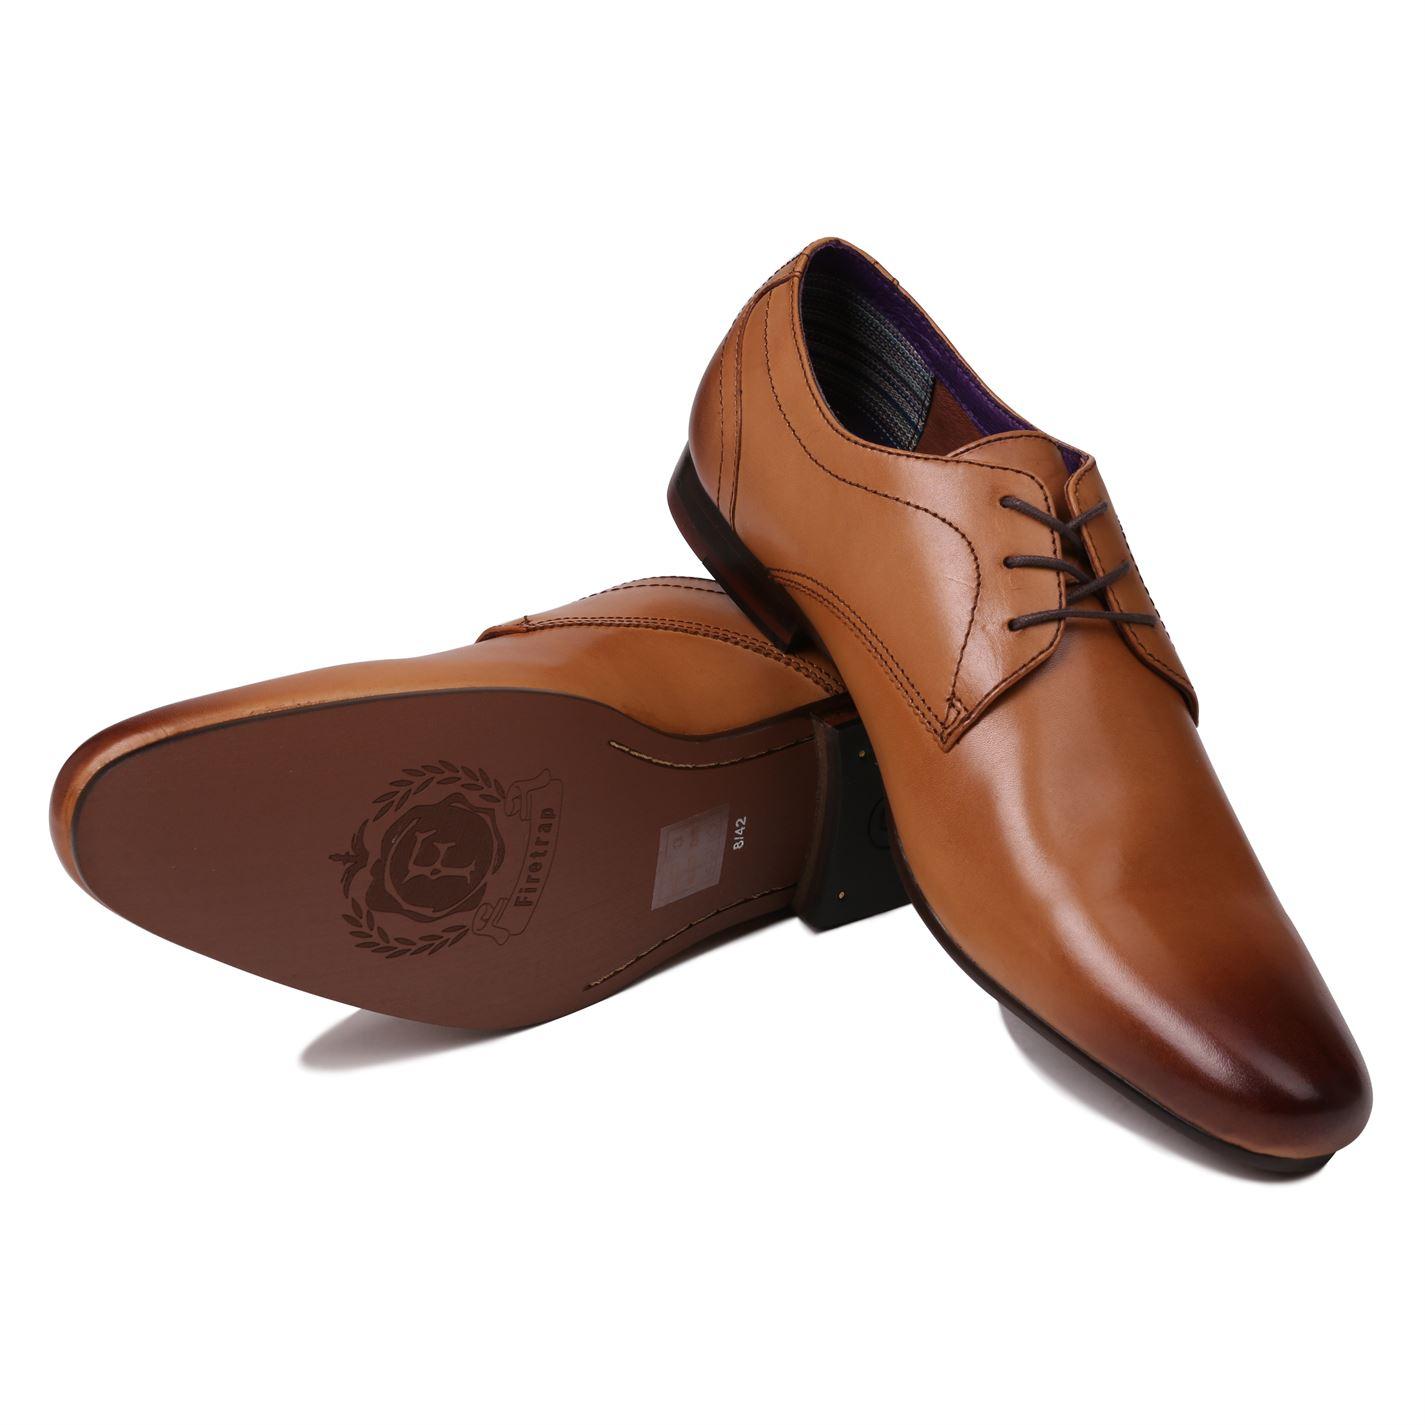 d37e4c47bd4819 Firetrap-Savoy-Shoes-Gents-Mens thumbnail 12